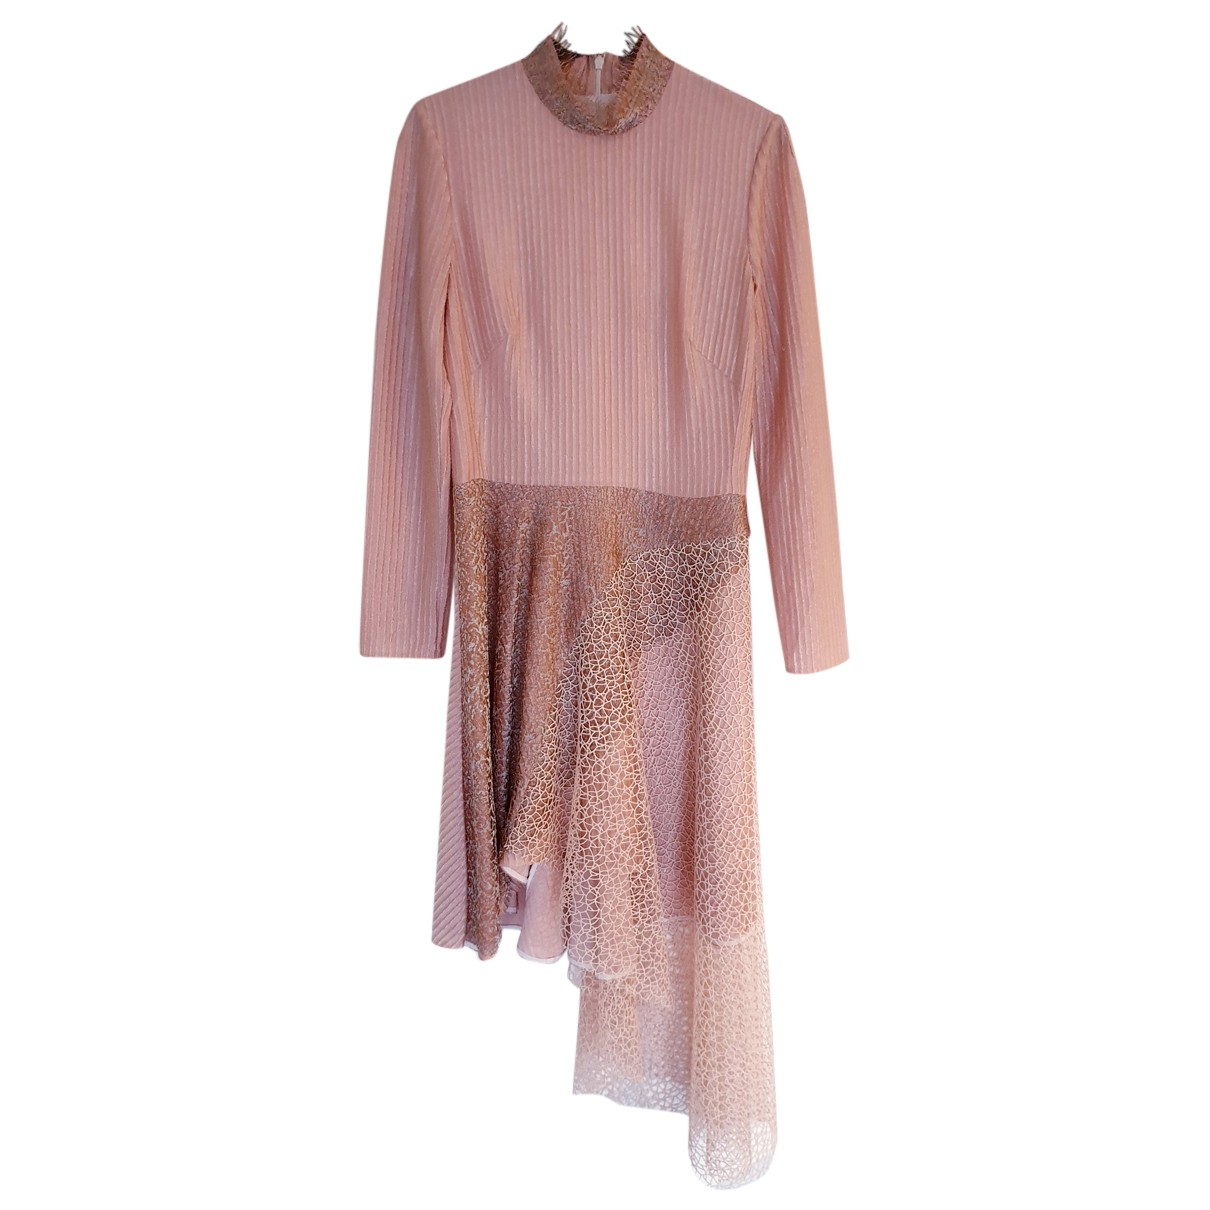 Peter Pilotto - Robe   pour femme en dentelle - rose